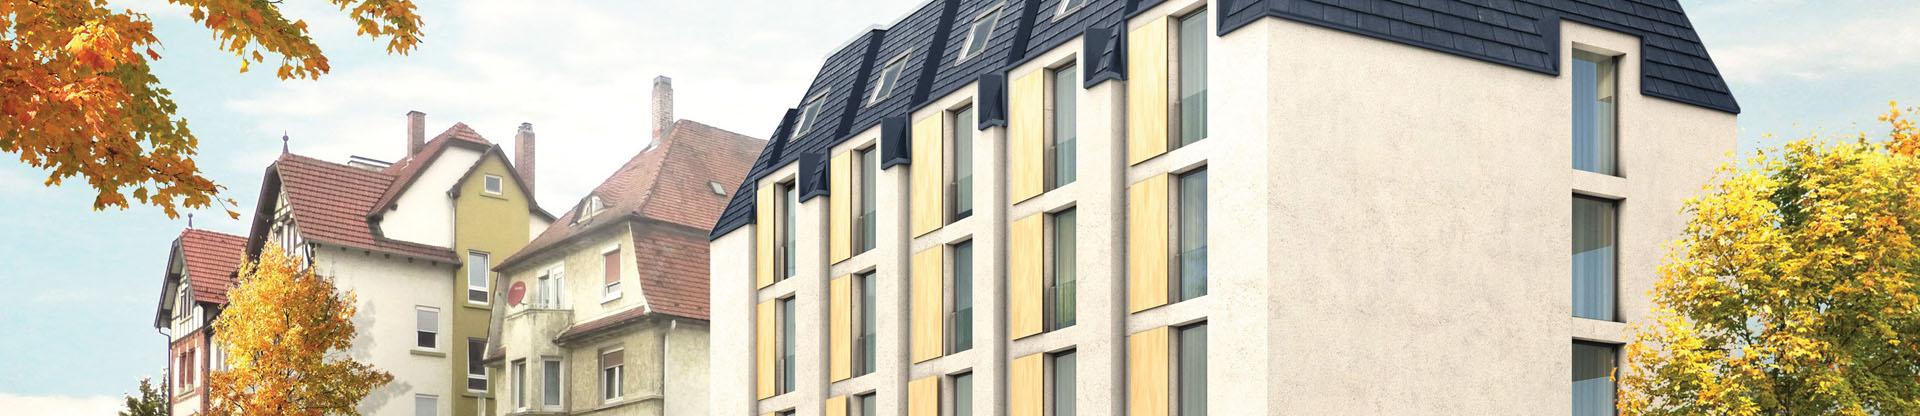 amp architekten hotel bauhofstra e ludwigsburg. Black Bedroom Furniture Sets. Home Design Ideas